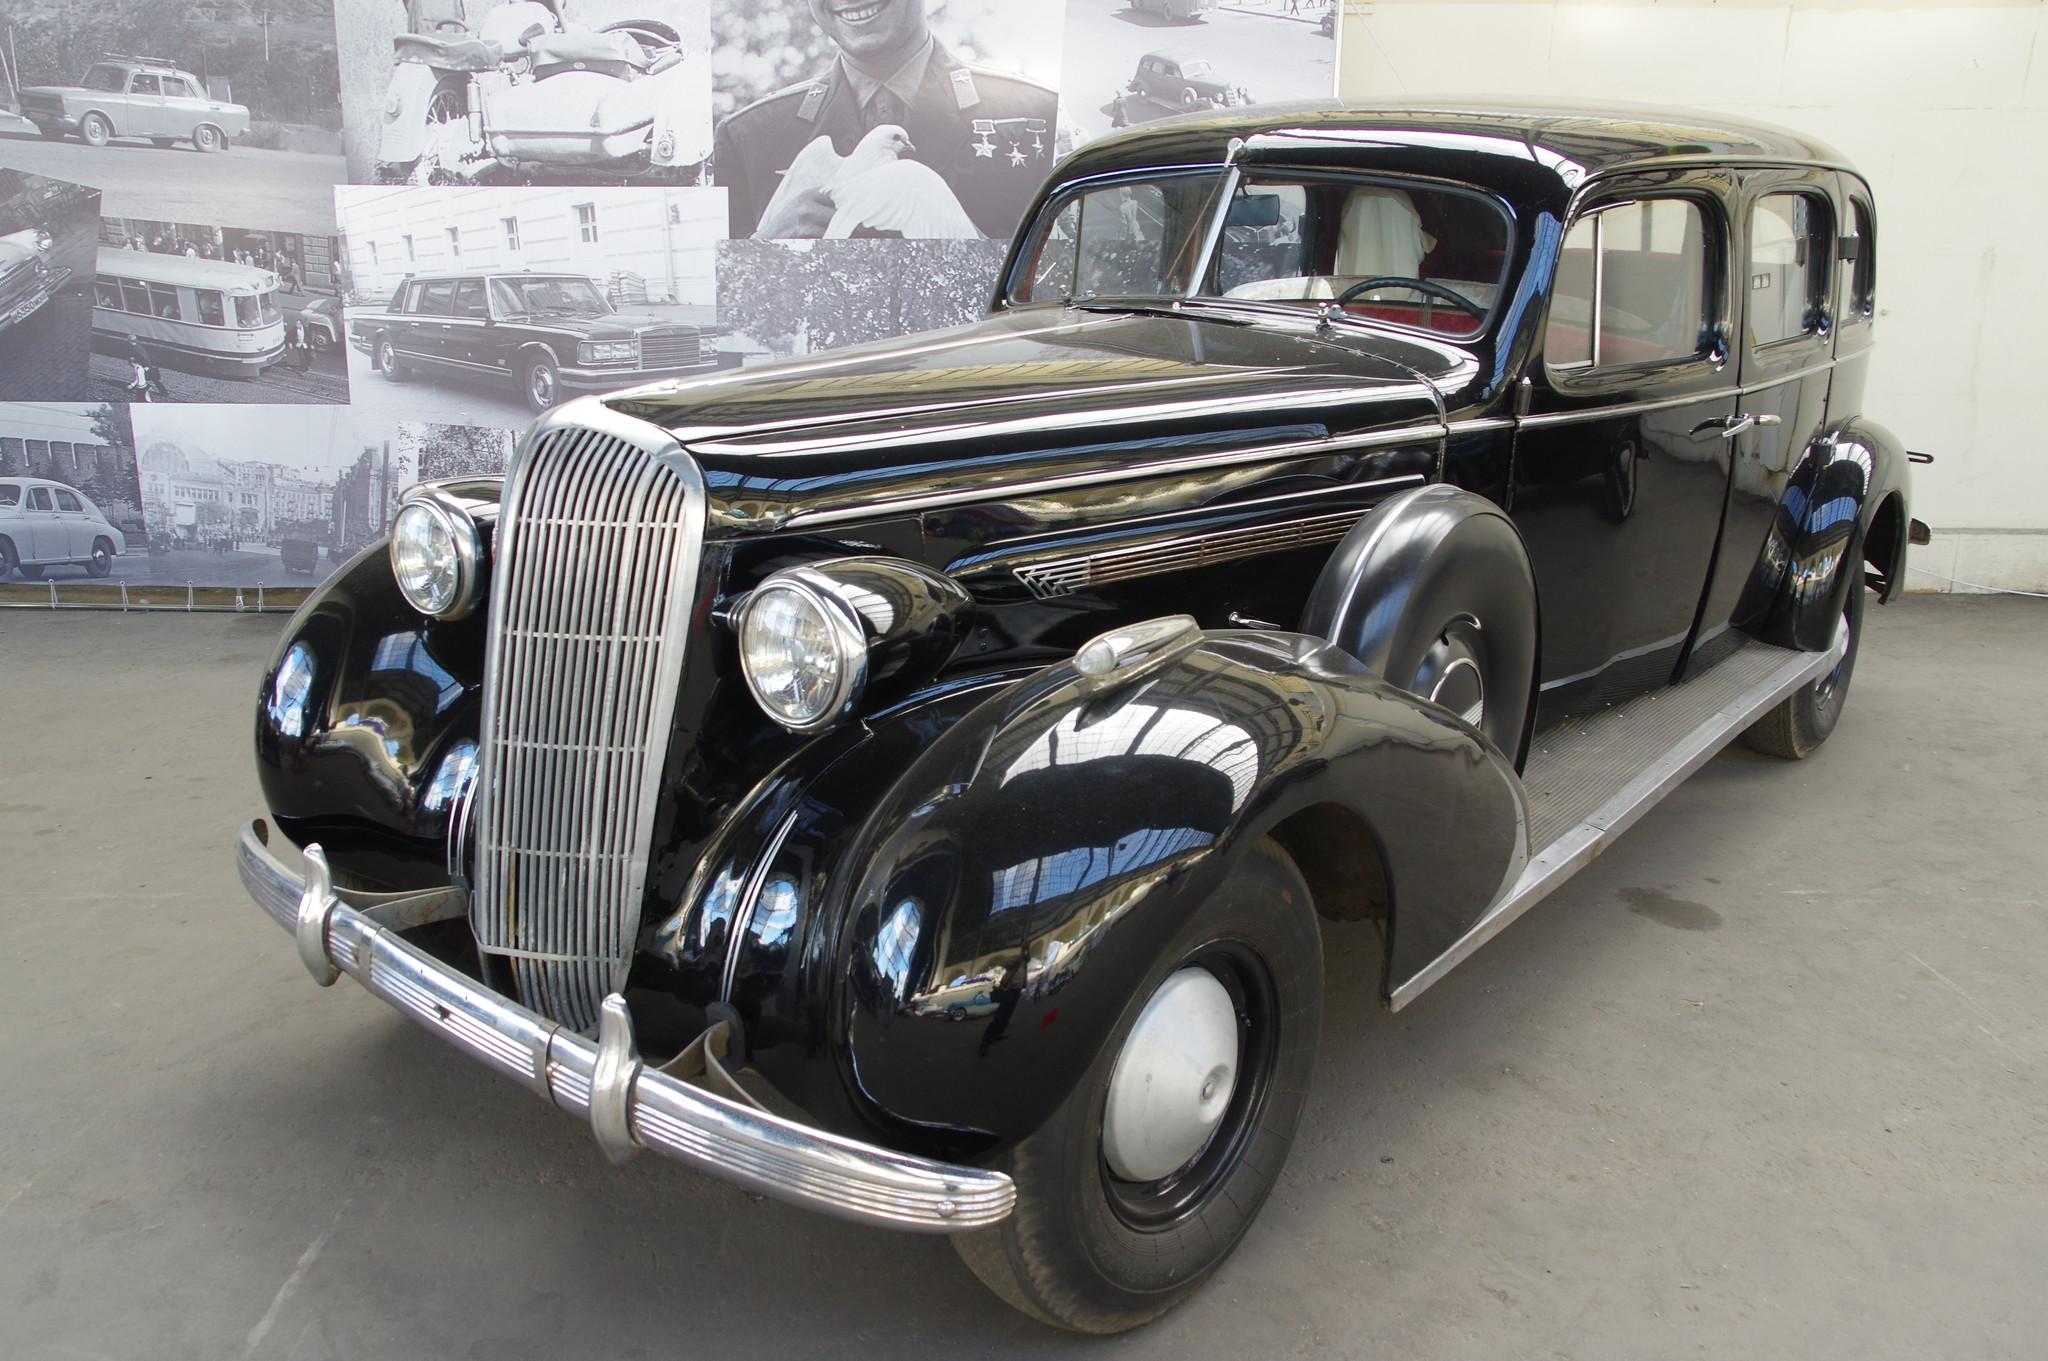 Автомобиль Buick Limited Series 90